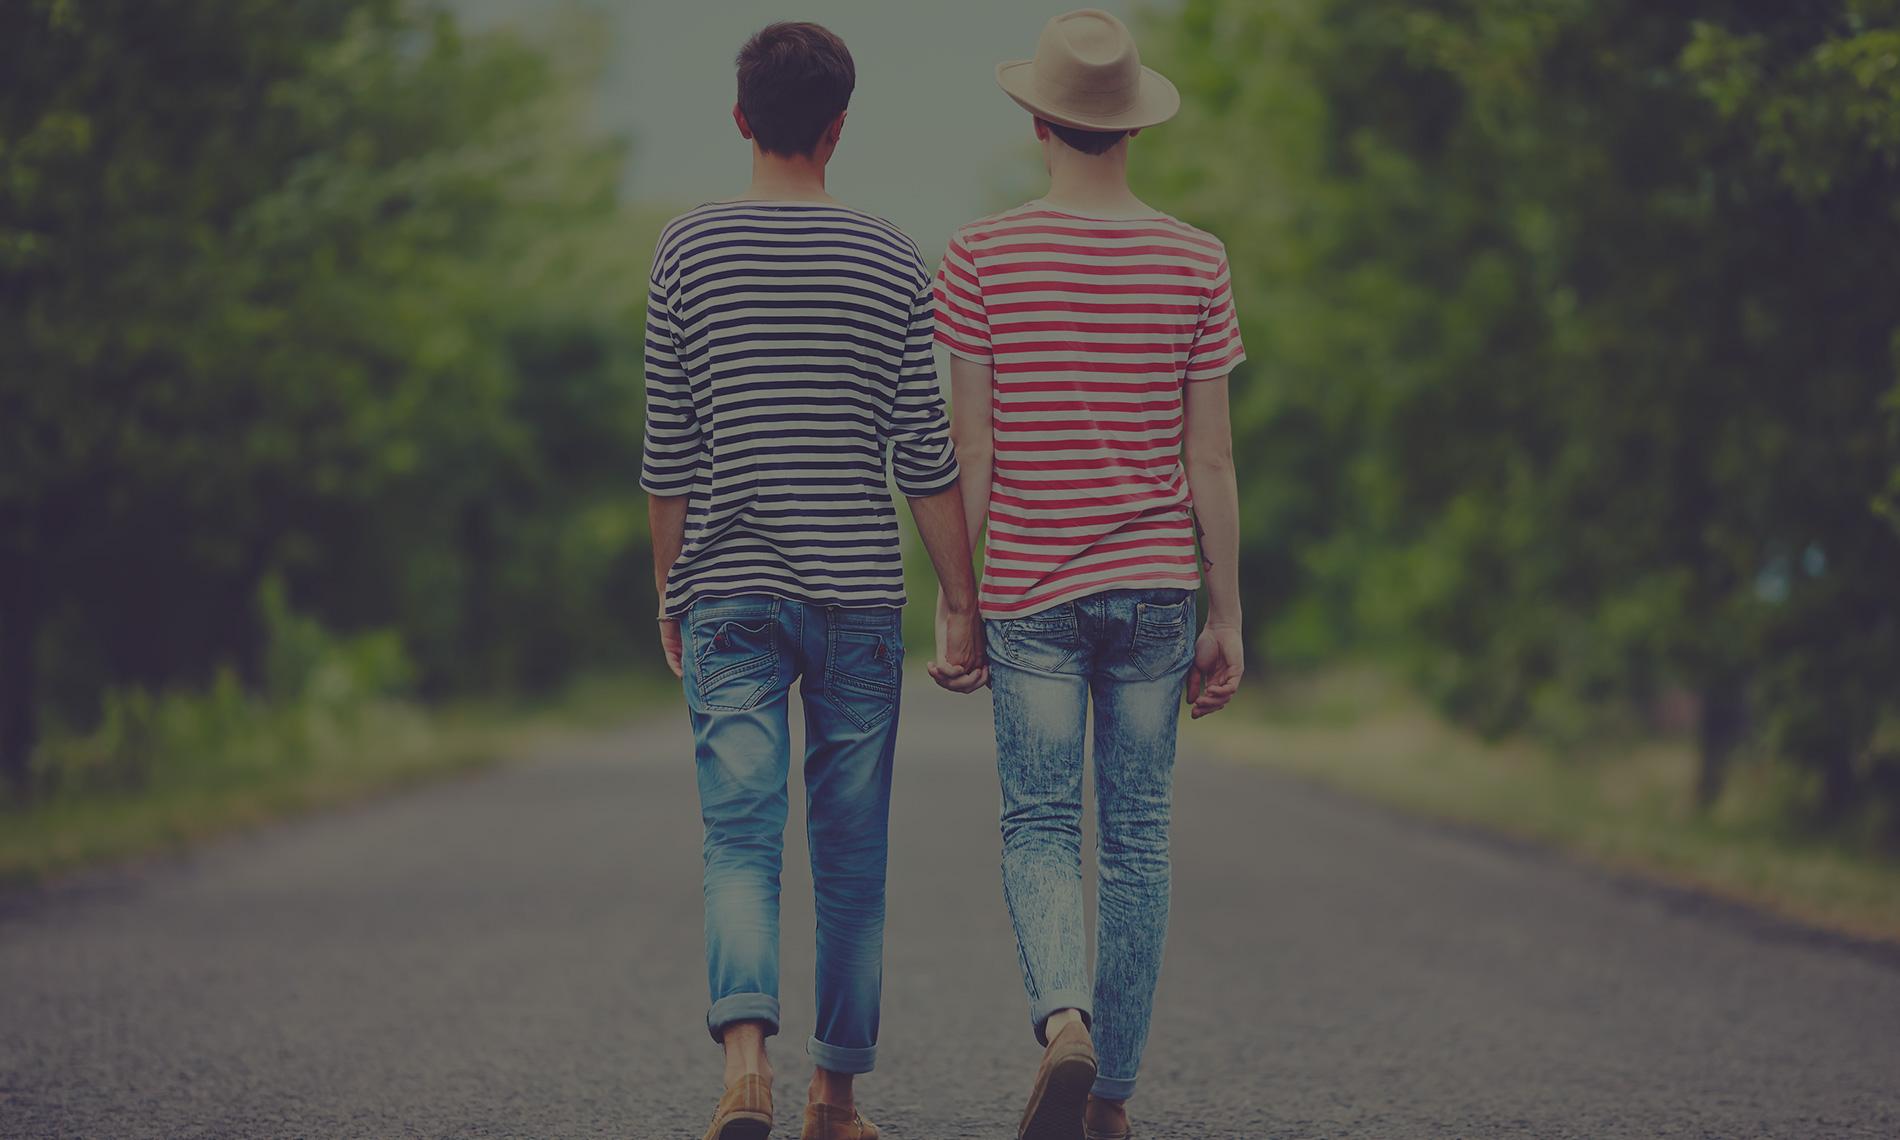 lieu de rencontre gay strasbourg à Brive la Gaillarde